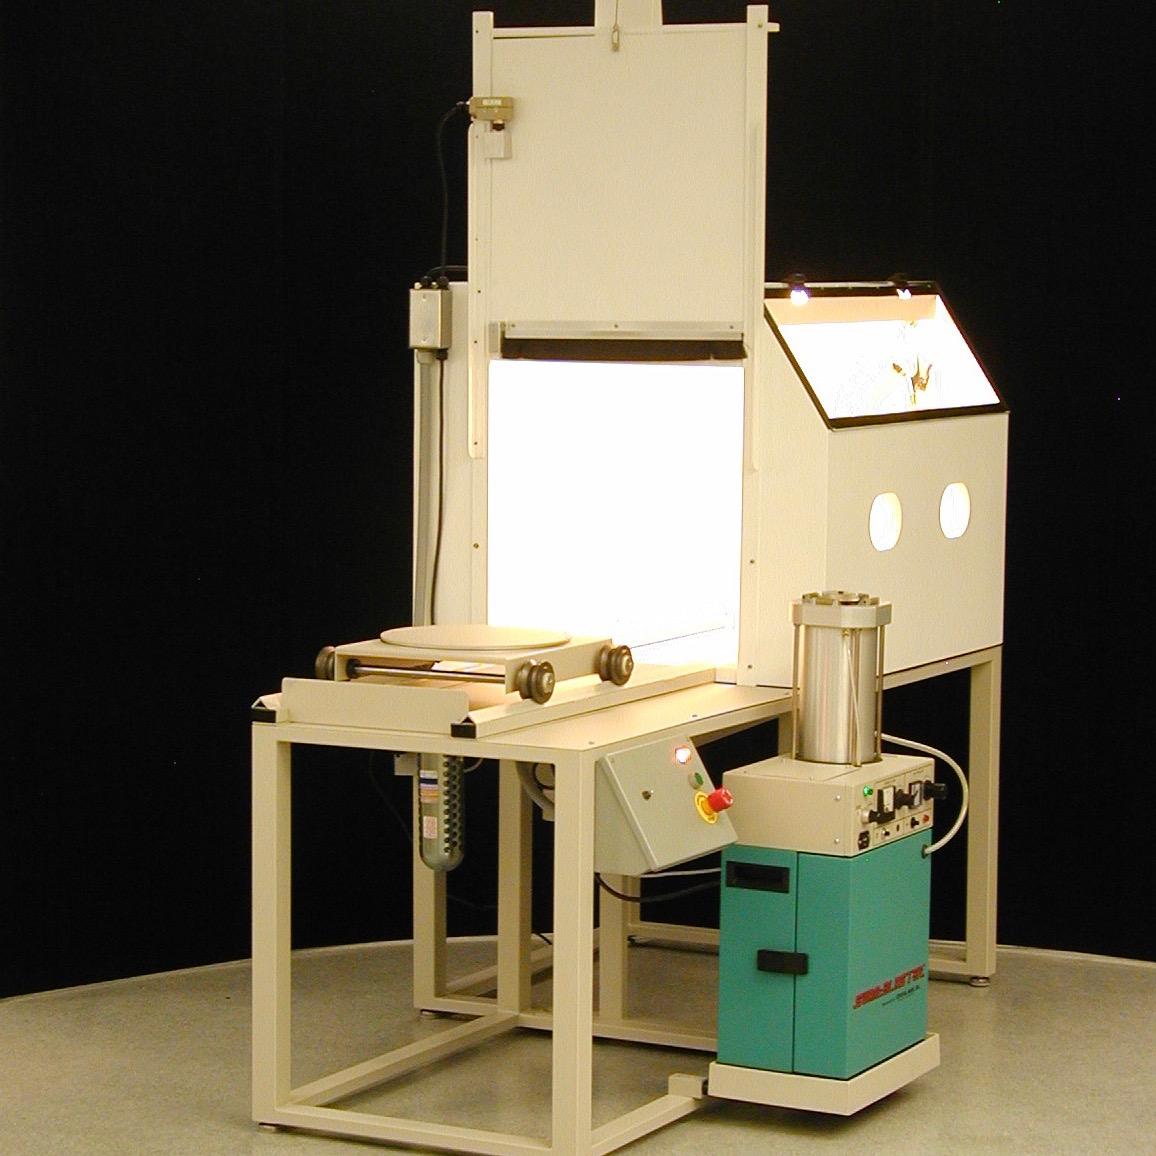 Automated Blasting Systems Inc Micro Sandblaster Lv 1